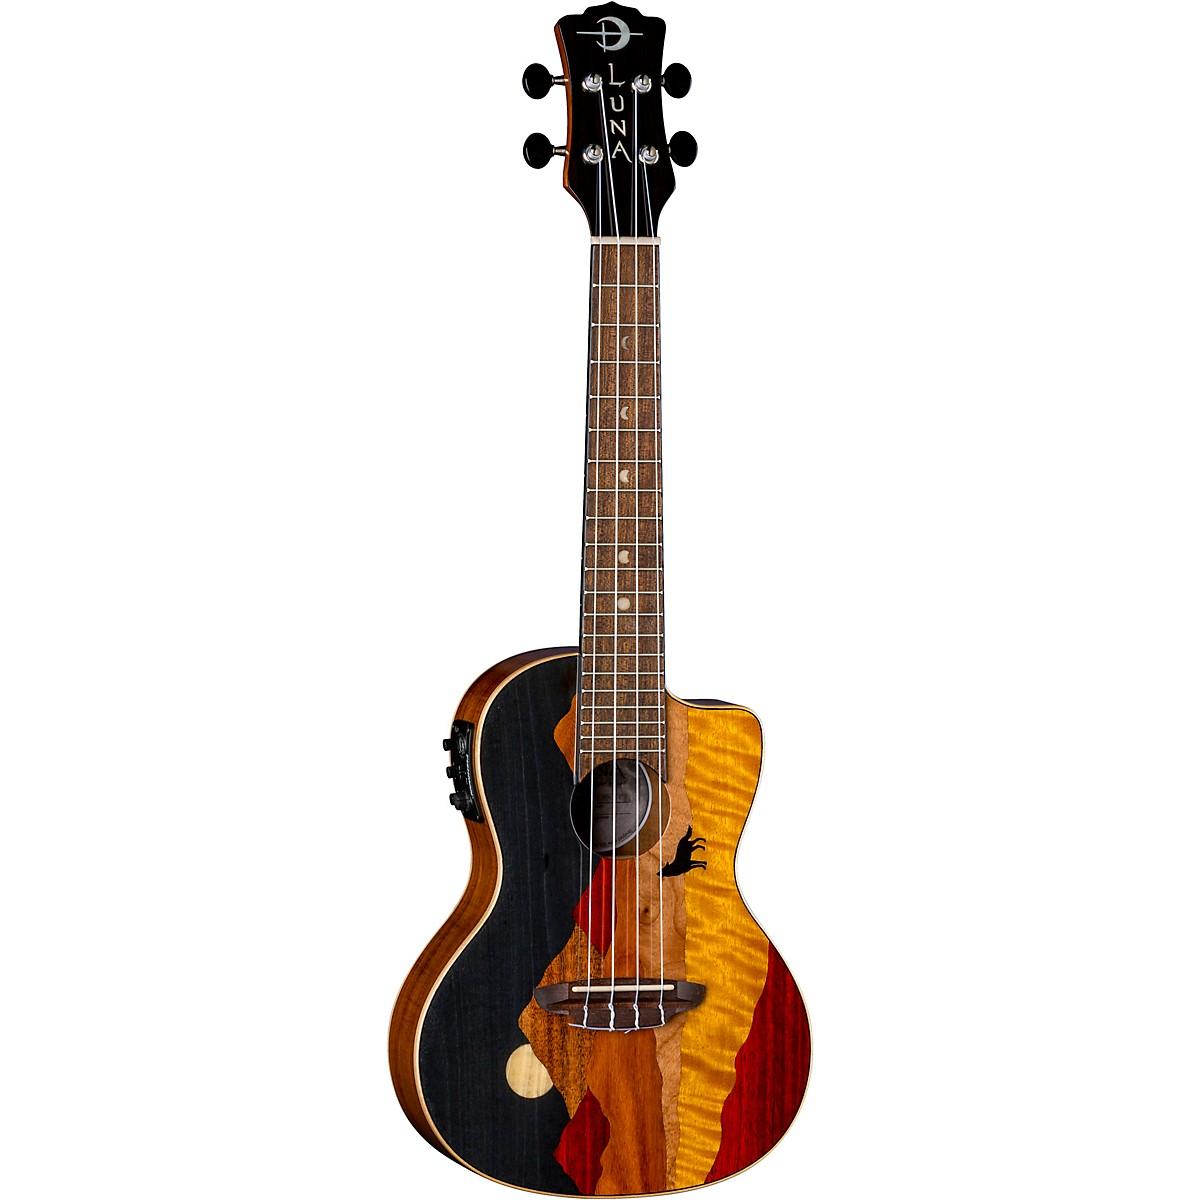 Luna Guitars Vista Wolf Tropical Wood Concert Acoustic-Electric Ukulele